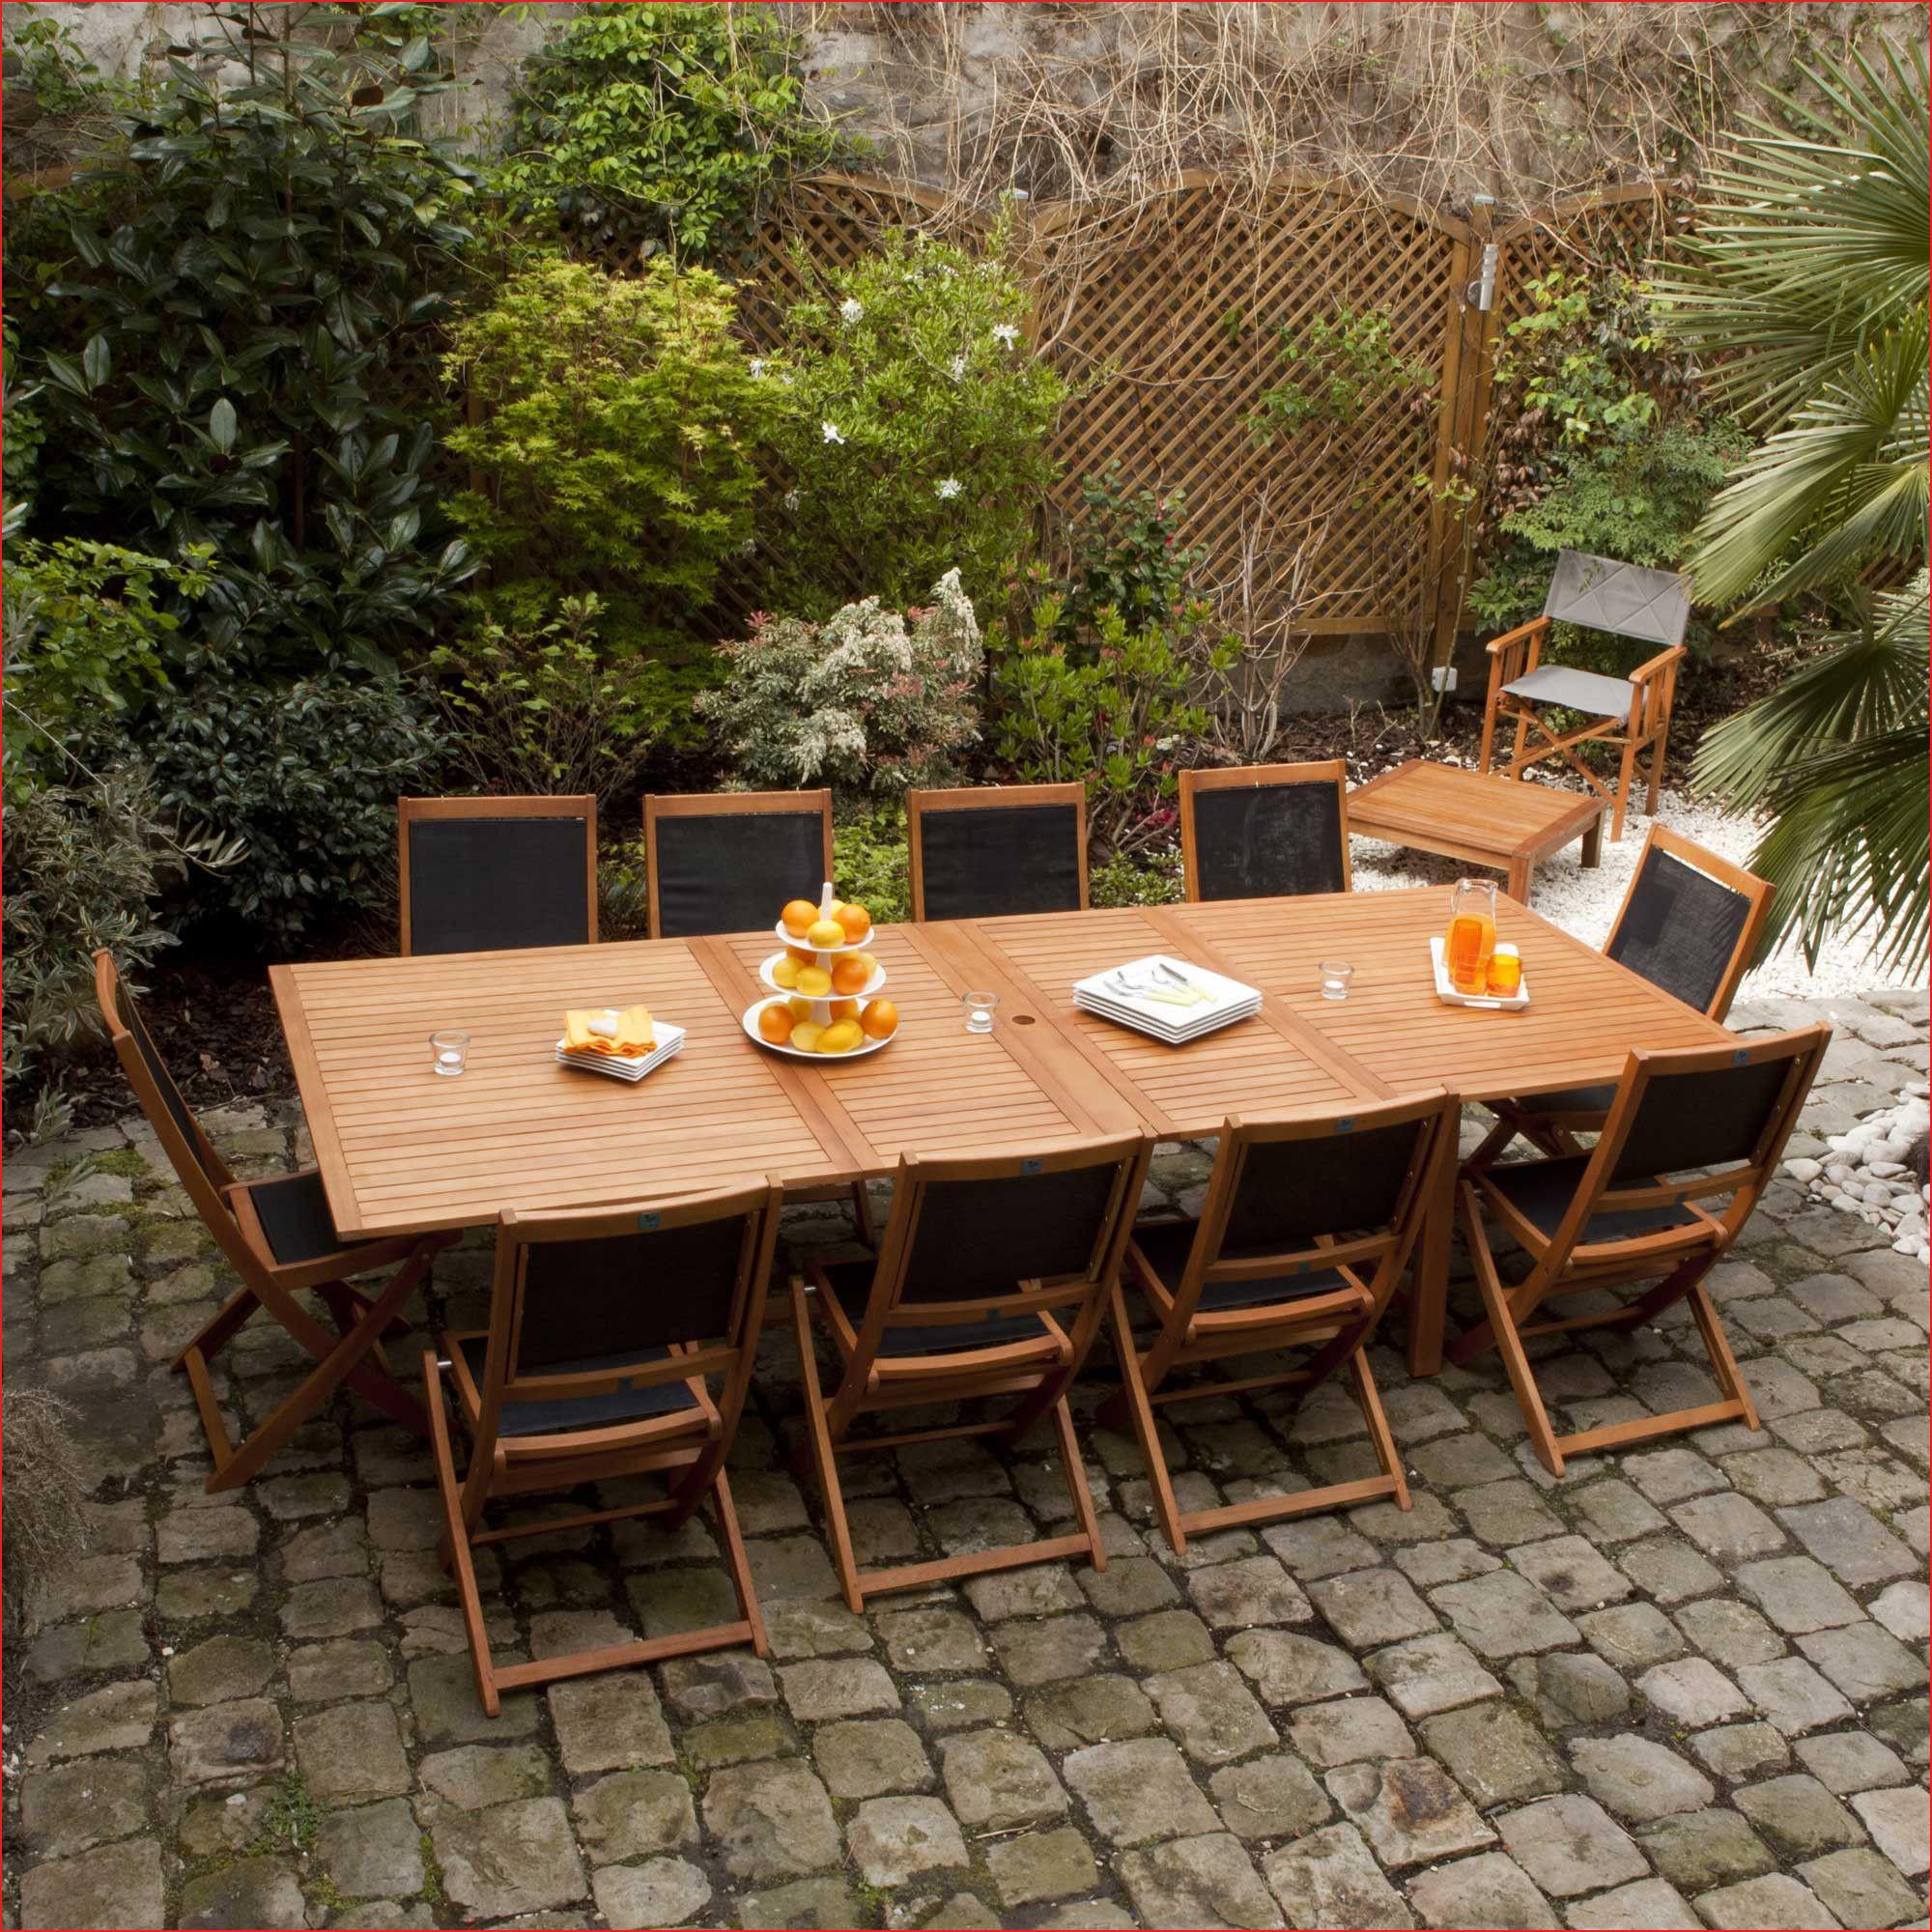 24 Inspirant Salon De Jardin Moins Cher | Salon Jardin pour Salon Jardin Enfant Pas Cher